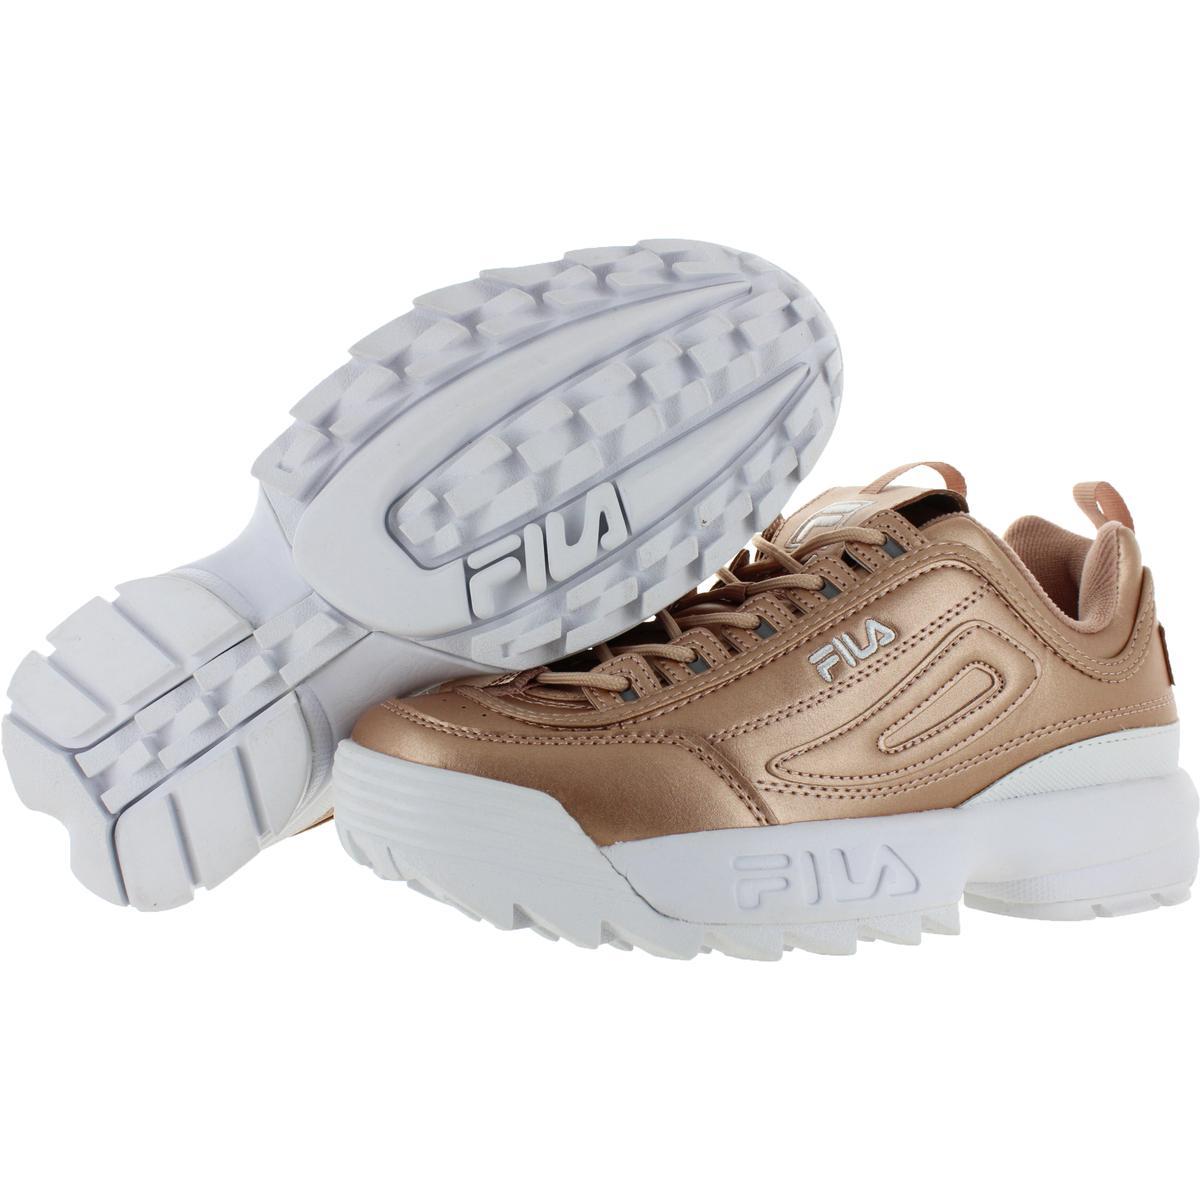 Fila-Womens-Disruptor-II-Premium-Metallic-Trainers-Sneakers-Shoes-BHFO-5237 thumbnail 13